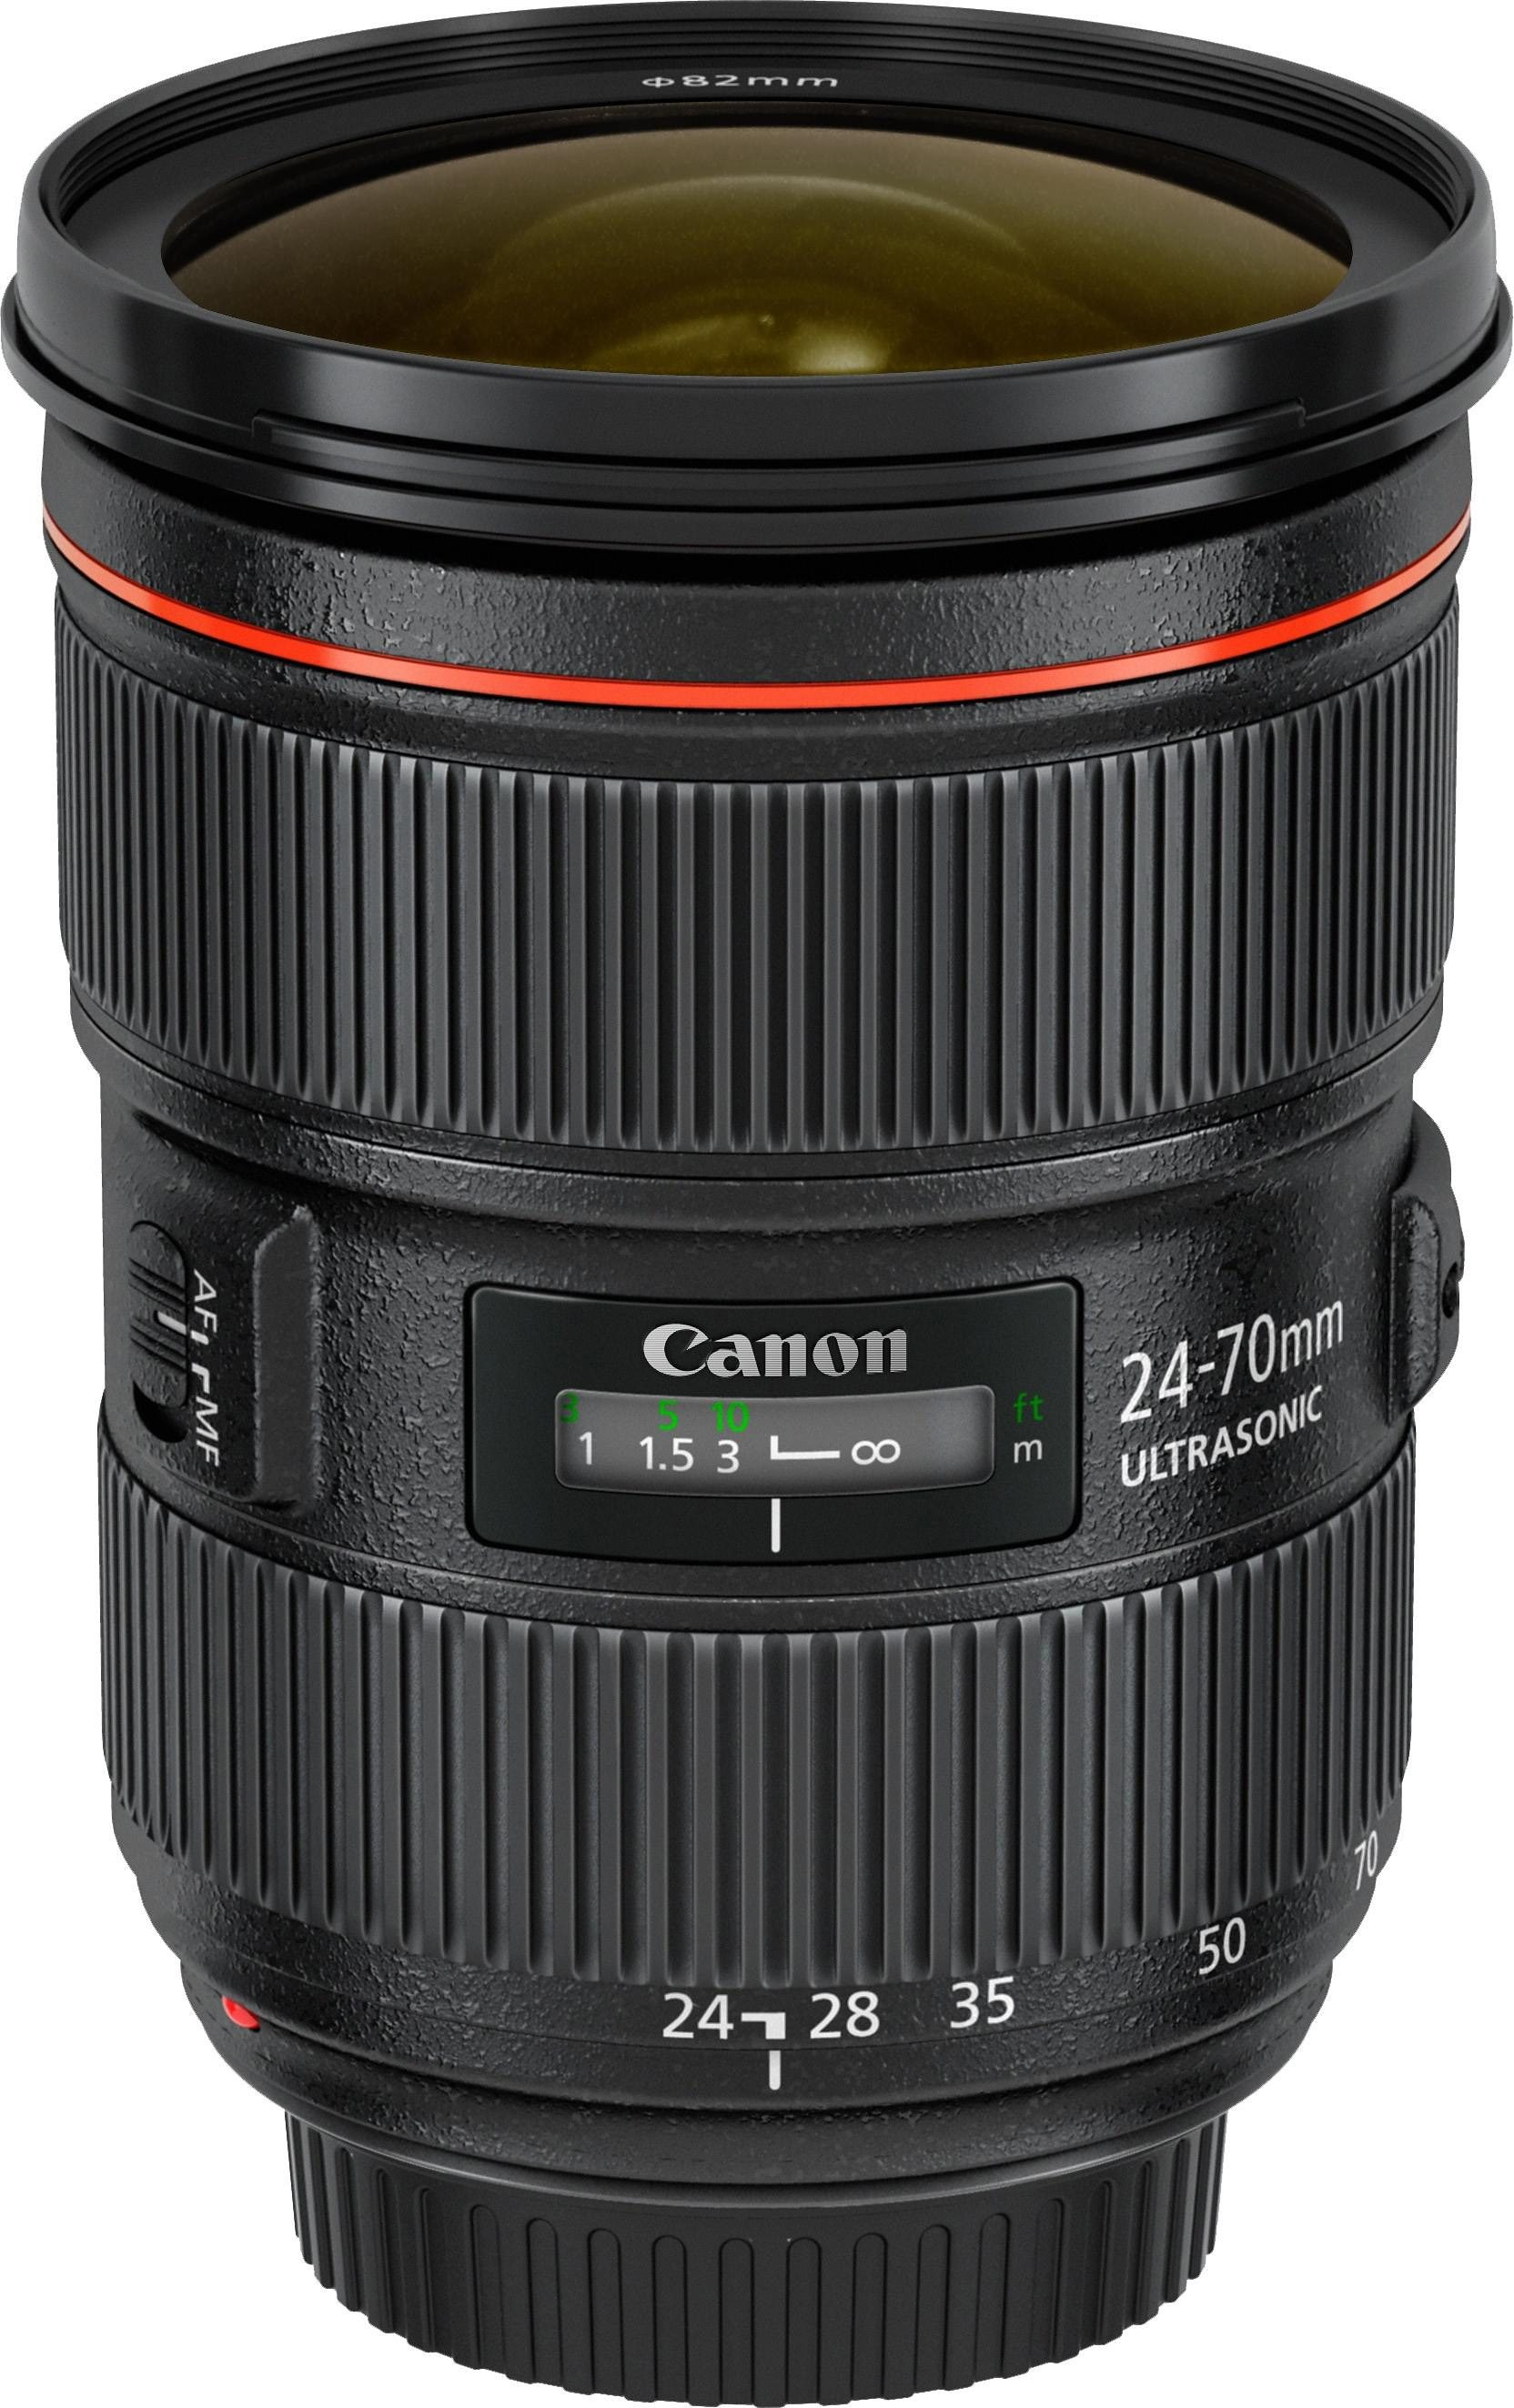 Canon EF 24-70mm f/2.8L II USM Standardzoom Objektiv